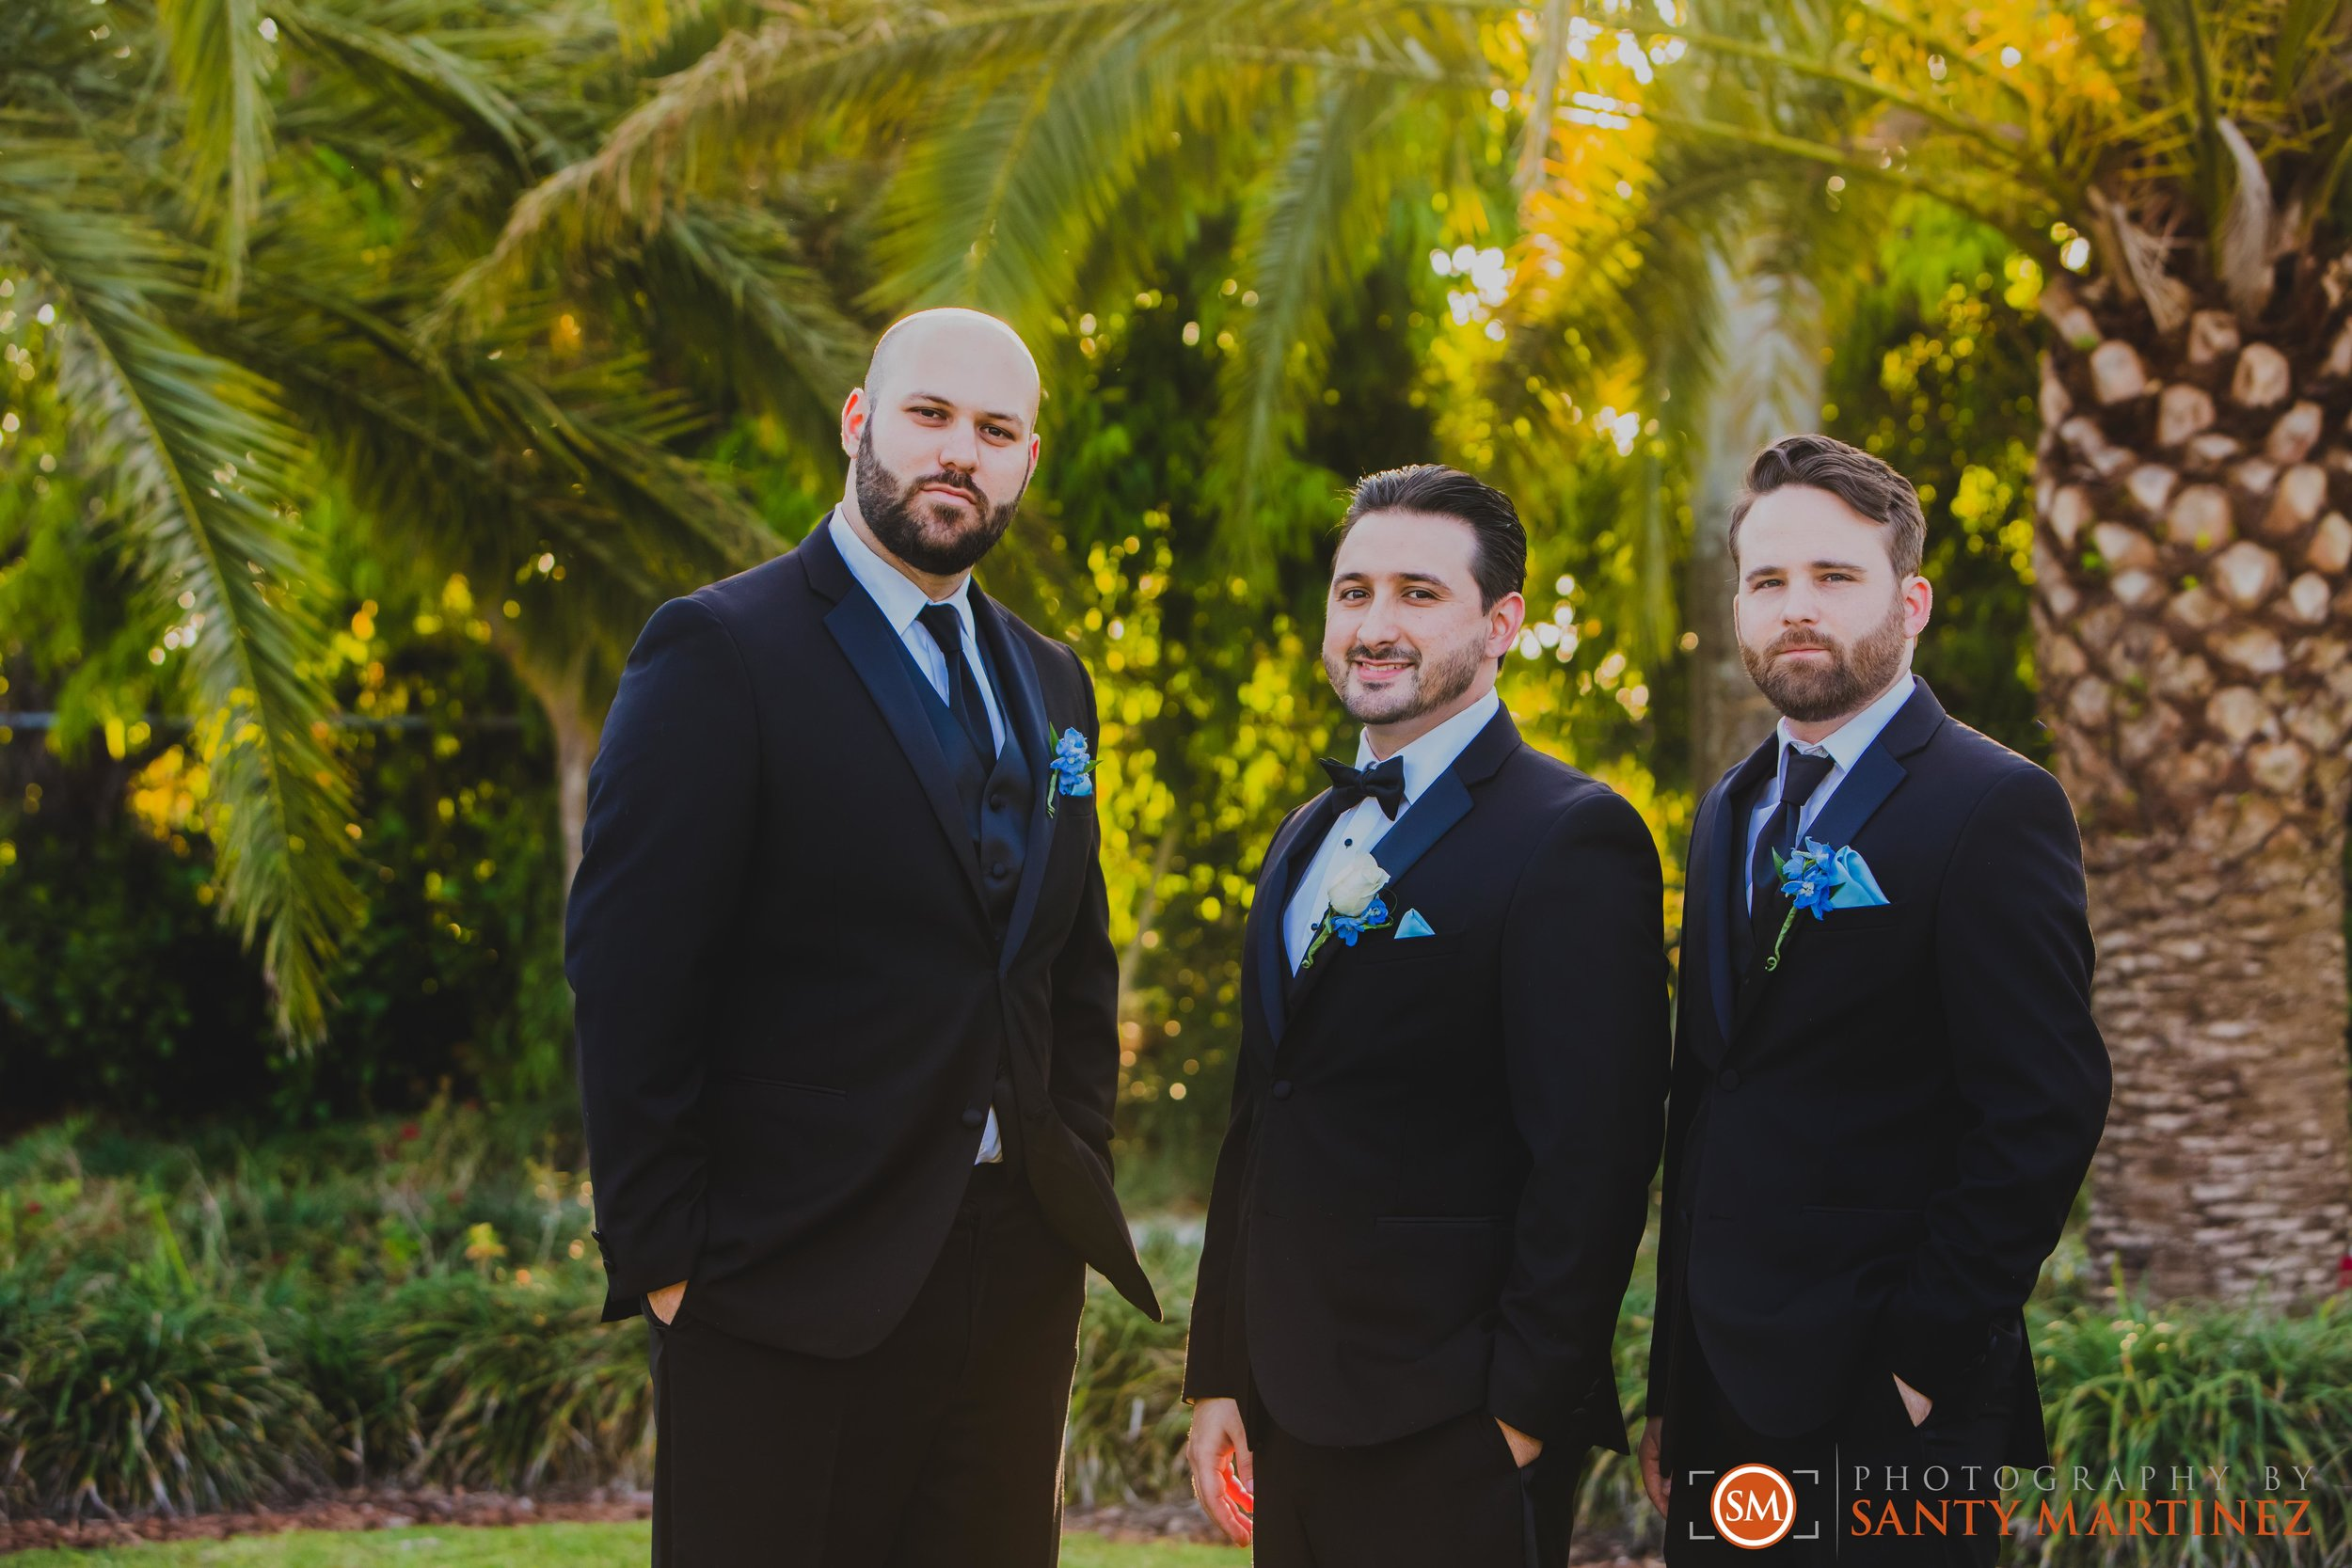 Wedding - Whimsical key West House - Photography by Santy Martinez-26.jpg